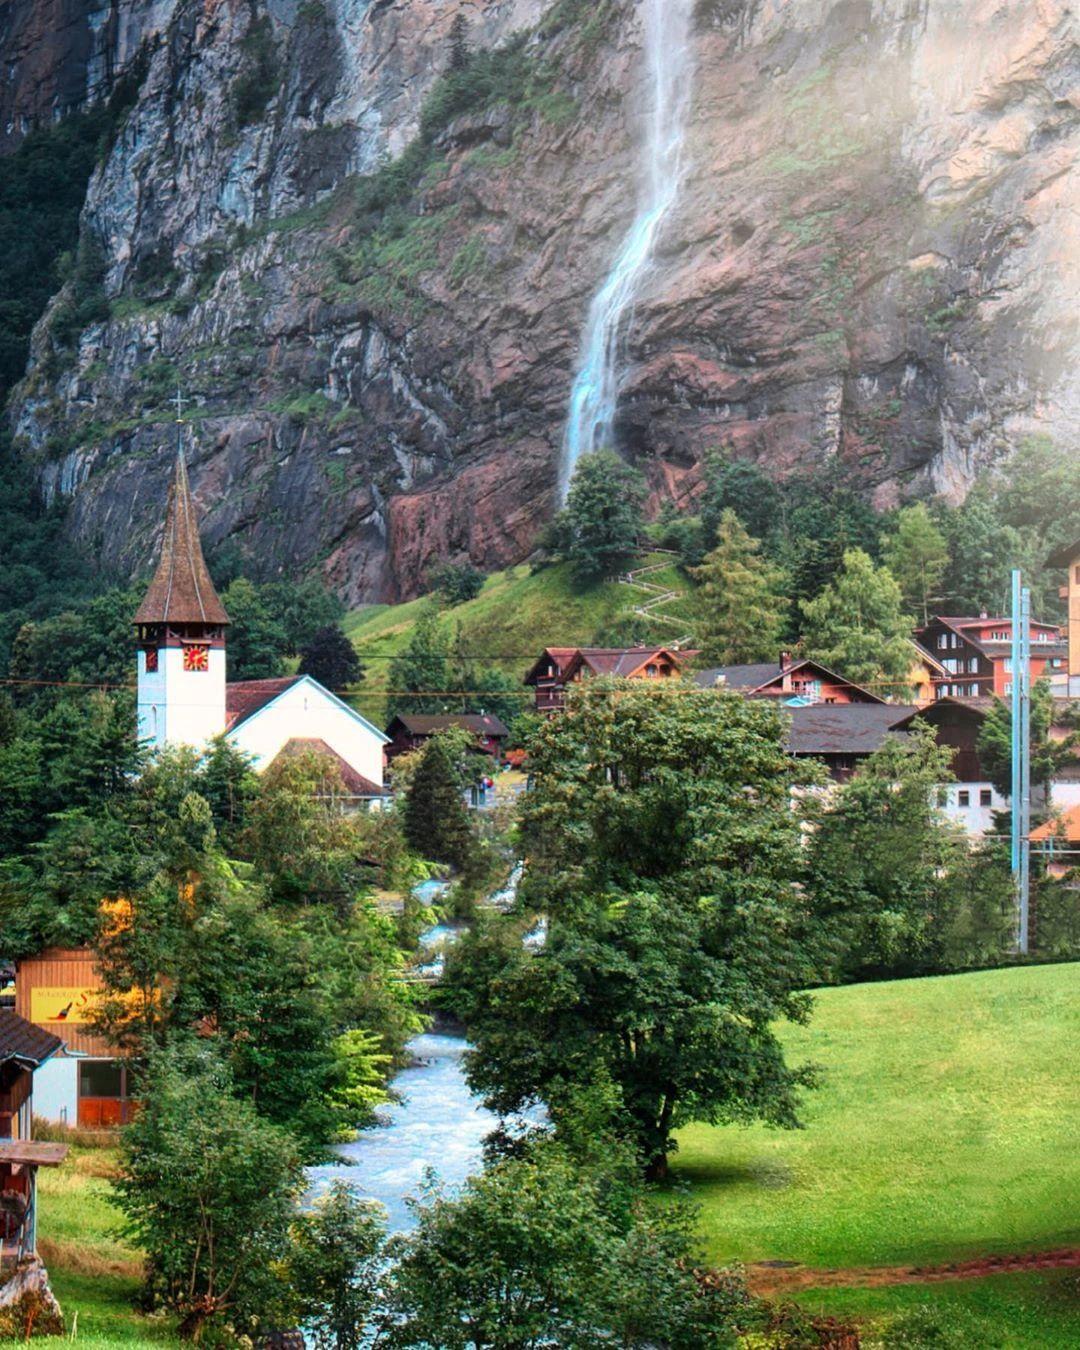 0ba5b640a1044632bf9fee99105401b6?from=pc - 瑞士:一个童话般的国家